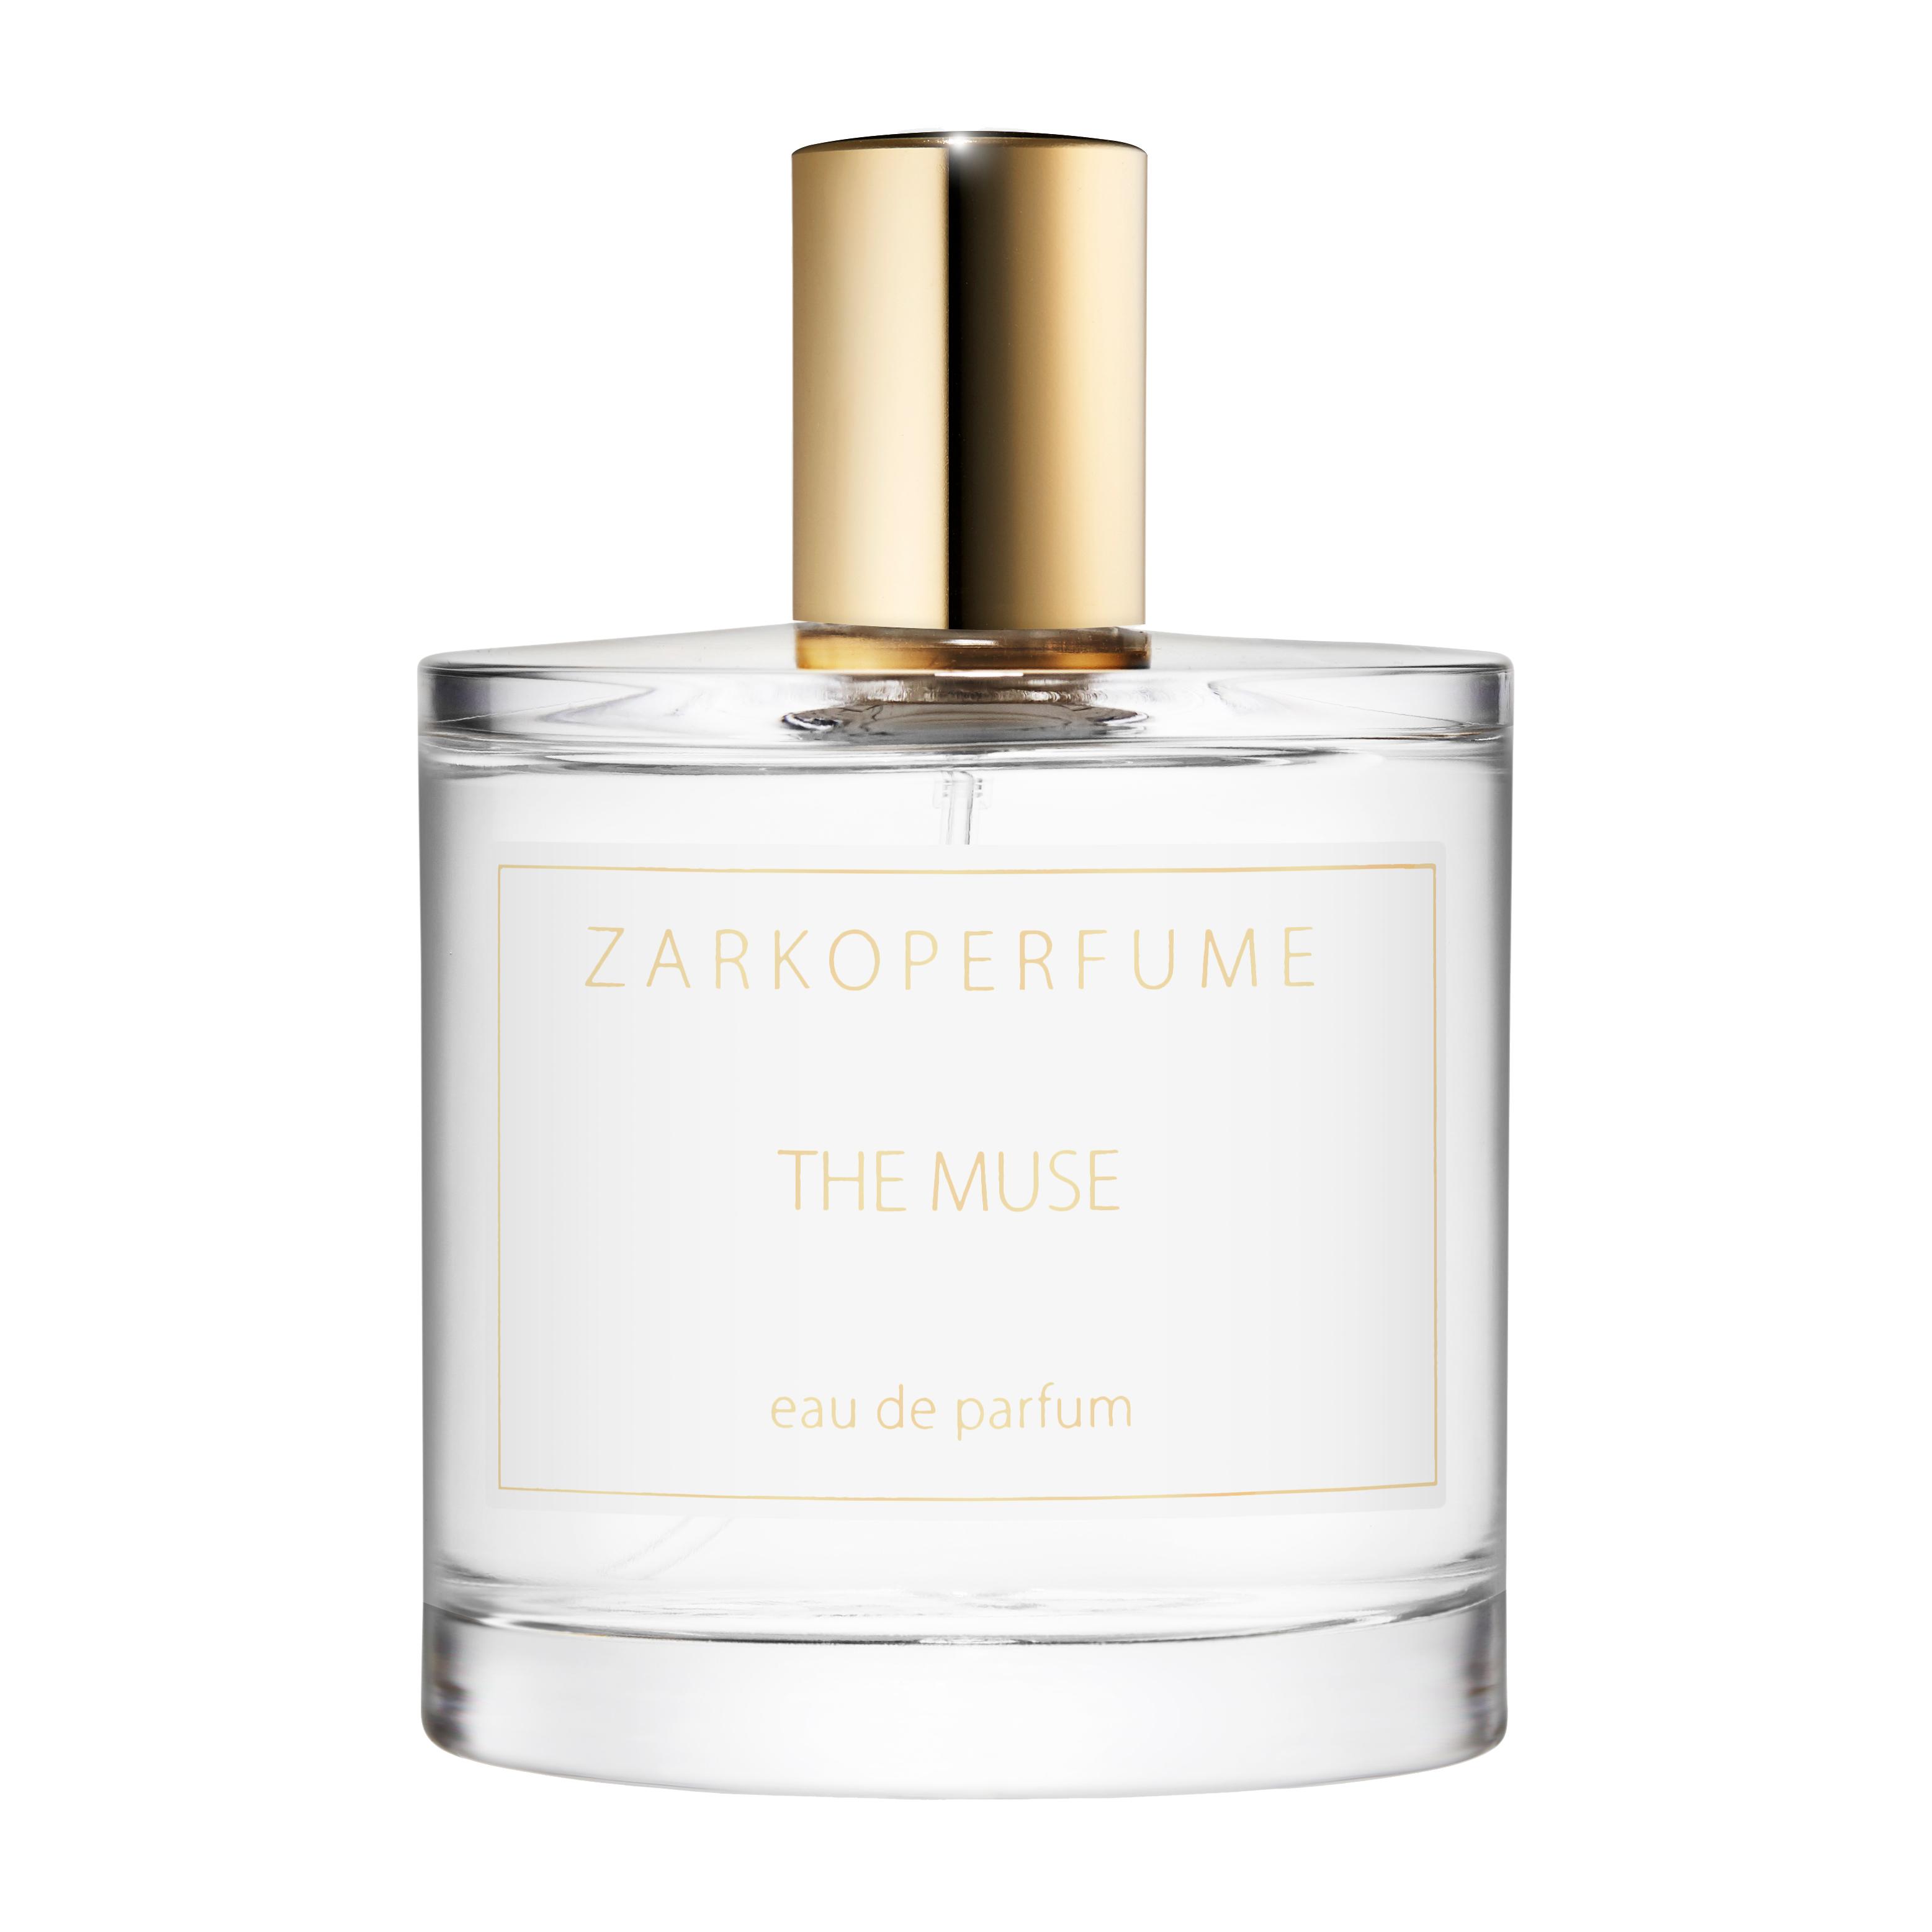 Zarkoperfume The Muse EDP, 100 ml